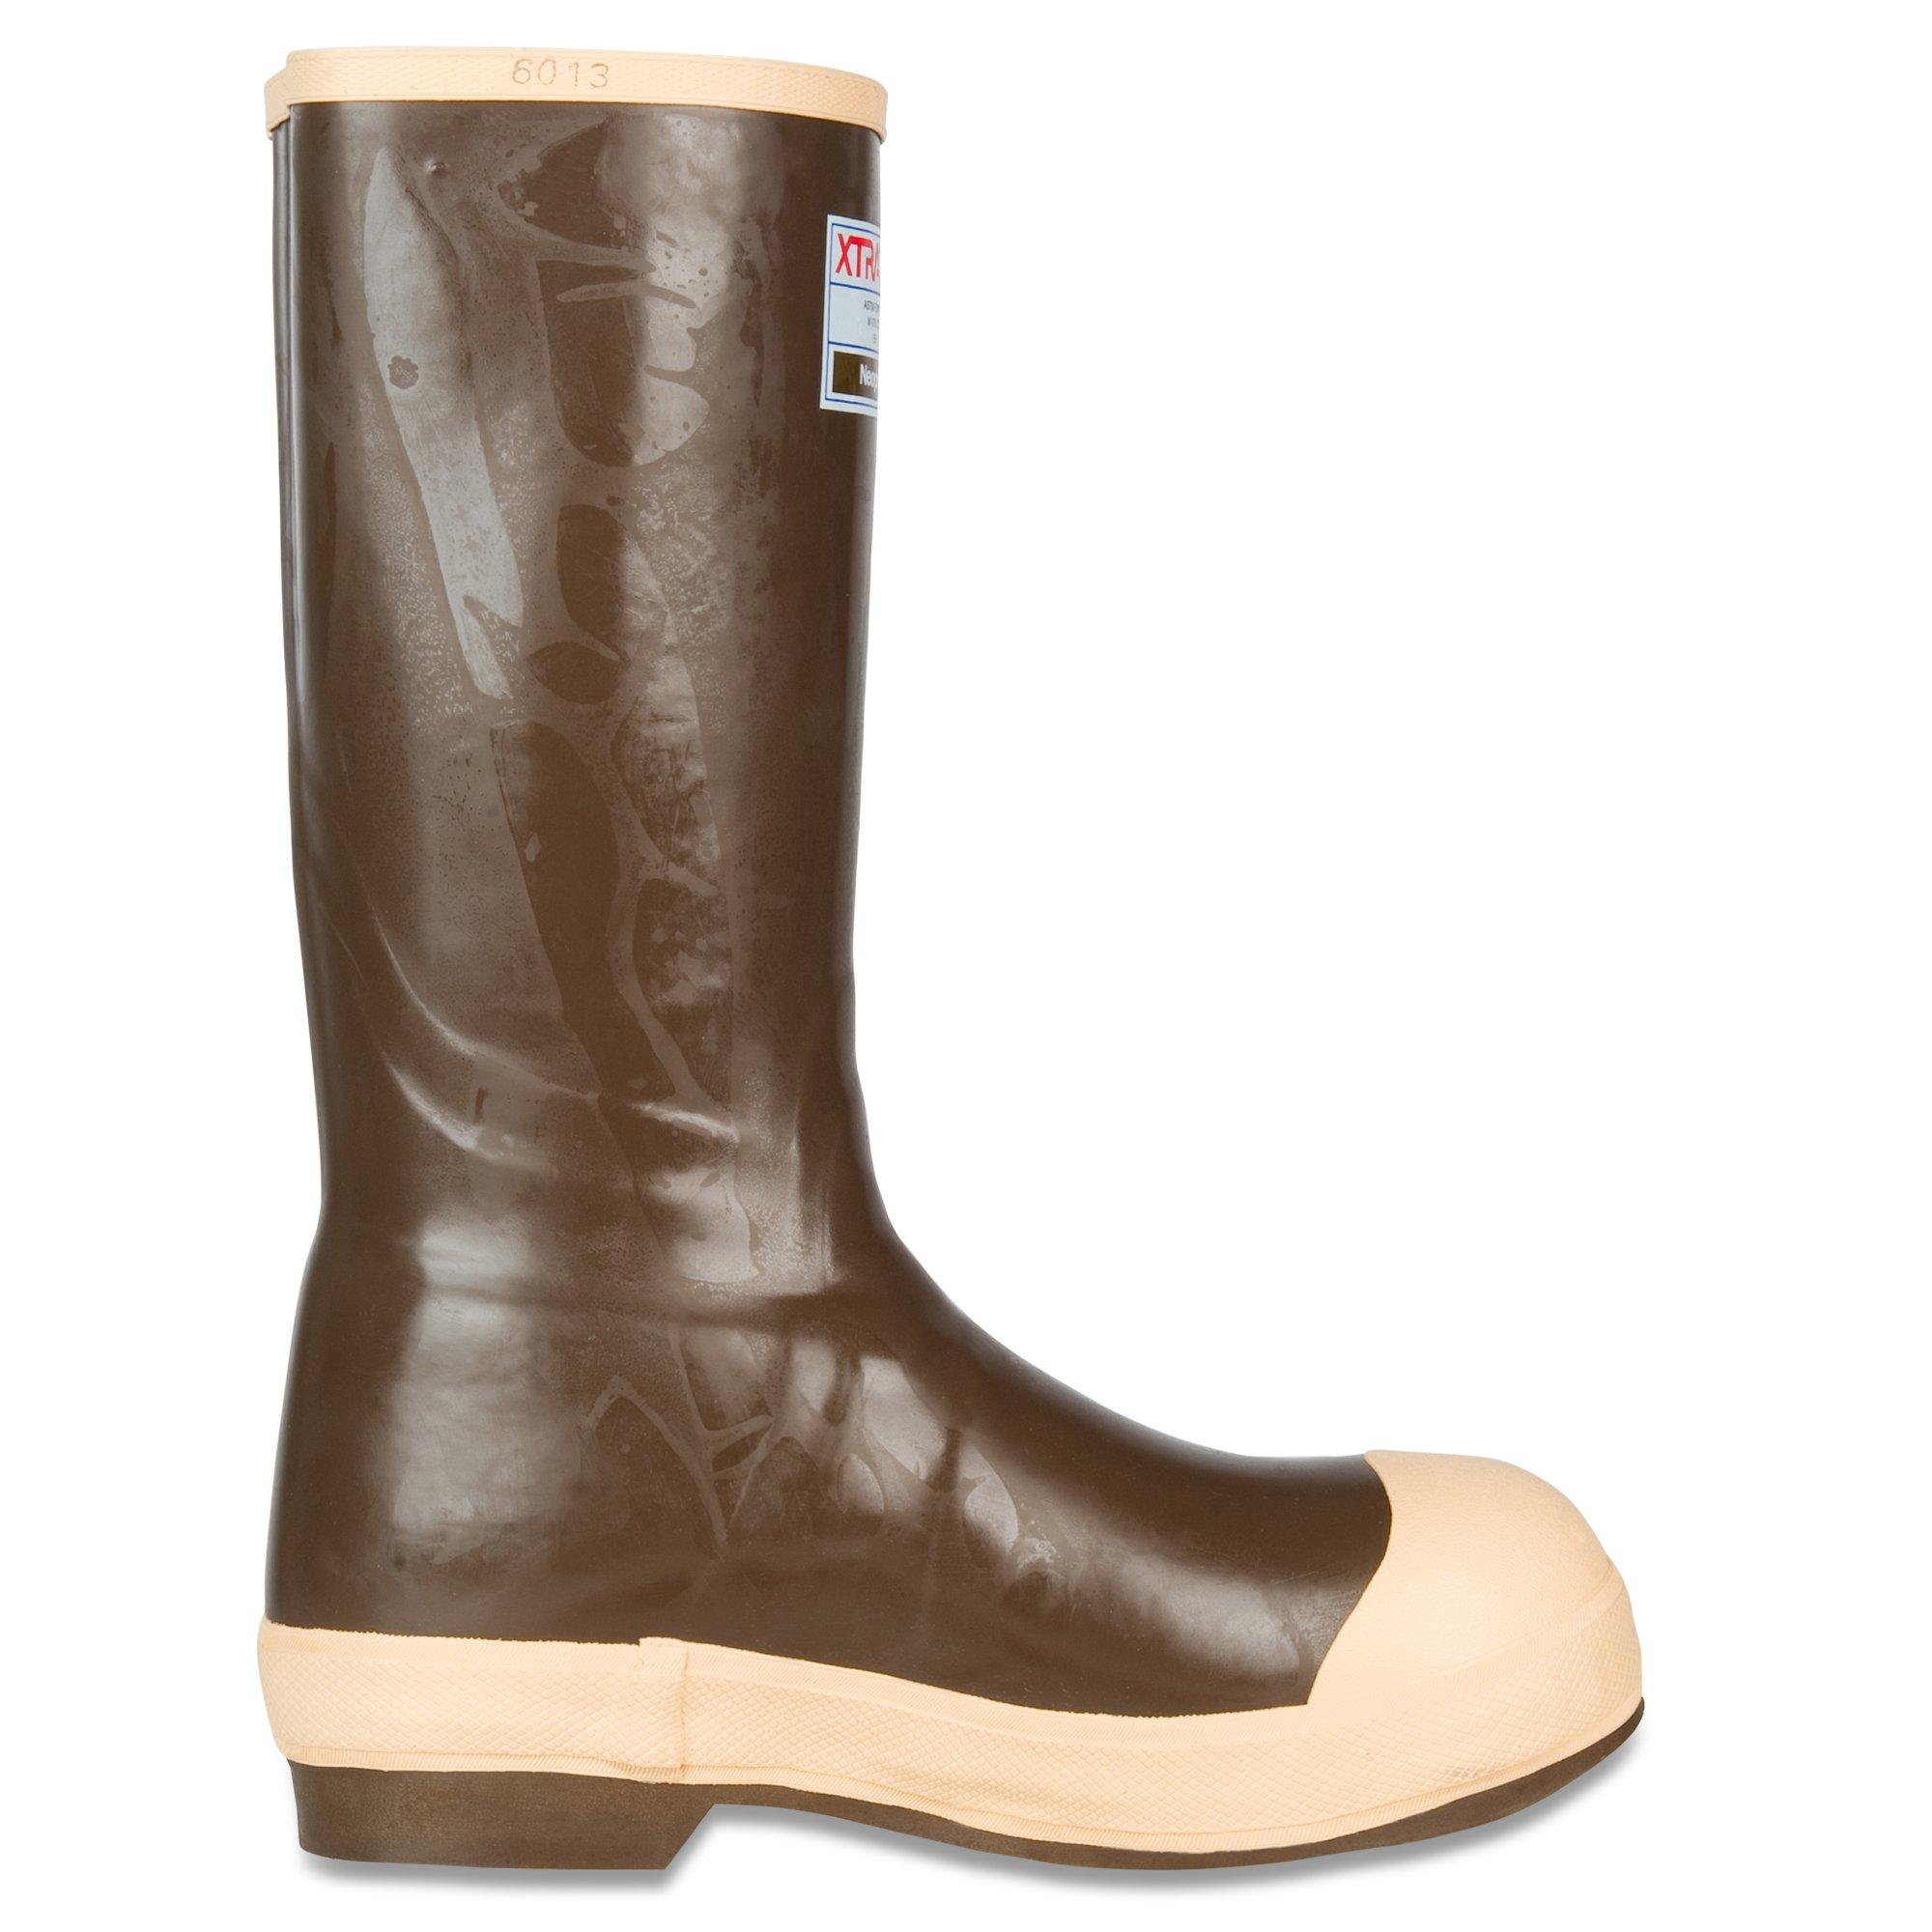 XTRATUF Legacy Series 15'' Neoprene Steel Toe Insulated Men's Fishing Boots, Copper & Tan (22273G) by Xtratuf (Image #5)